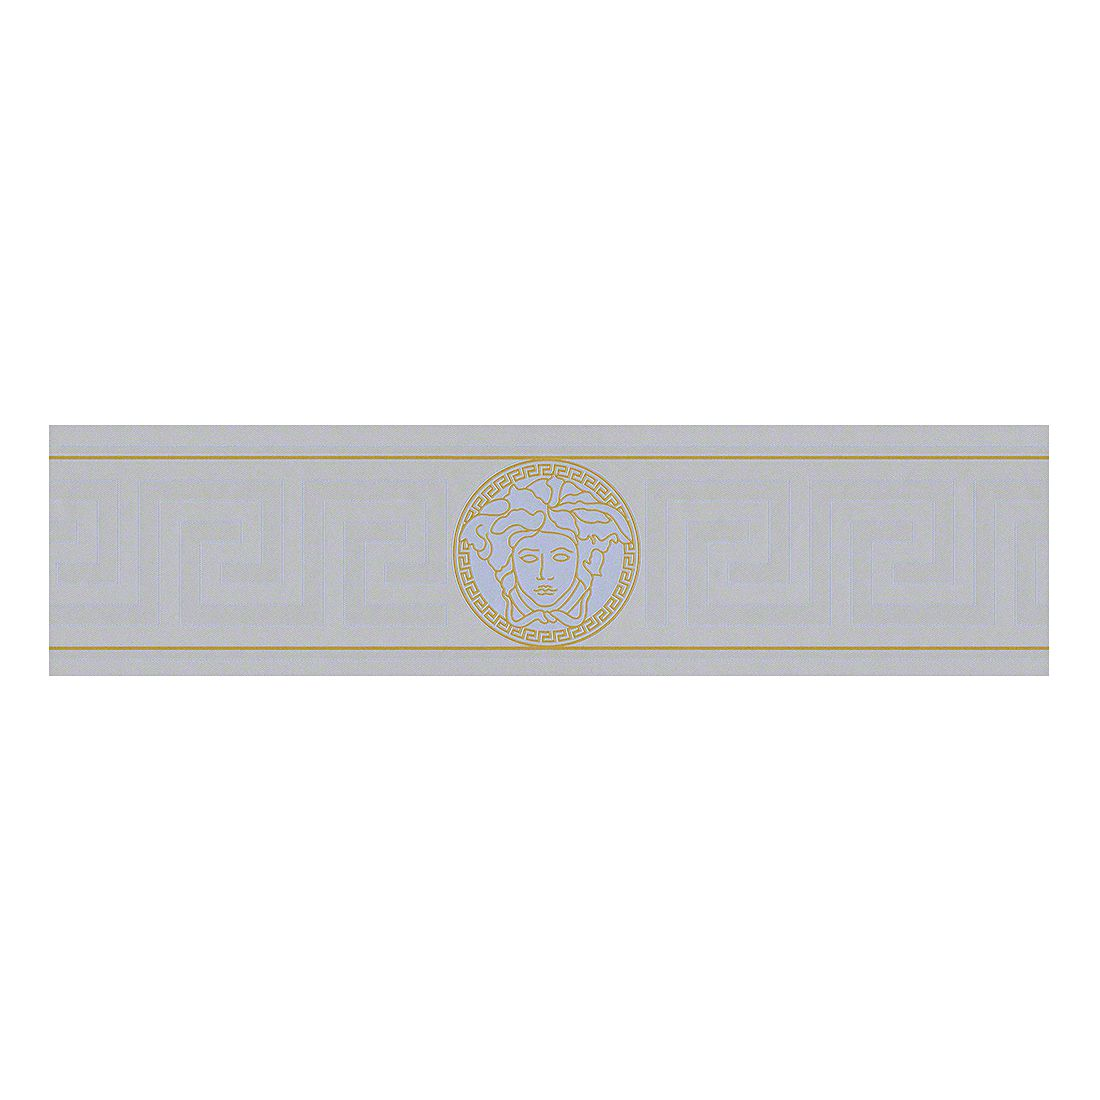 Bordüre Greek – silberfarben – goldfarben – fein strukturiert – glatt, VERSACE Home bestellen